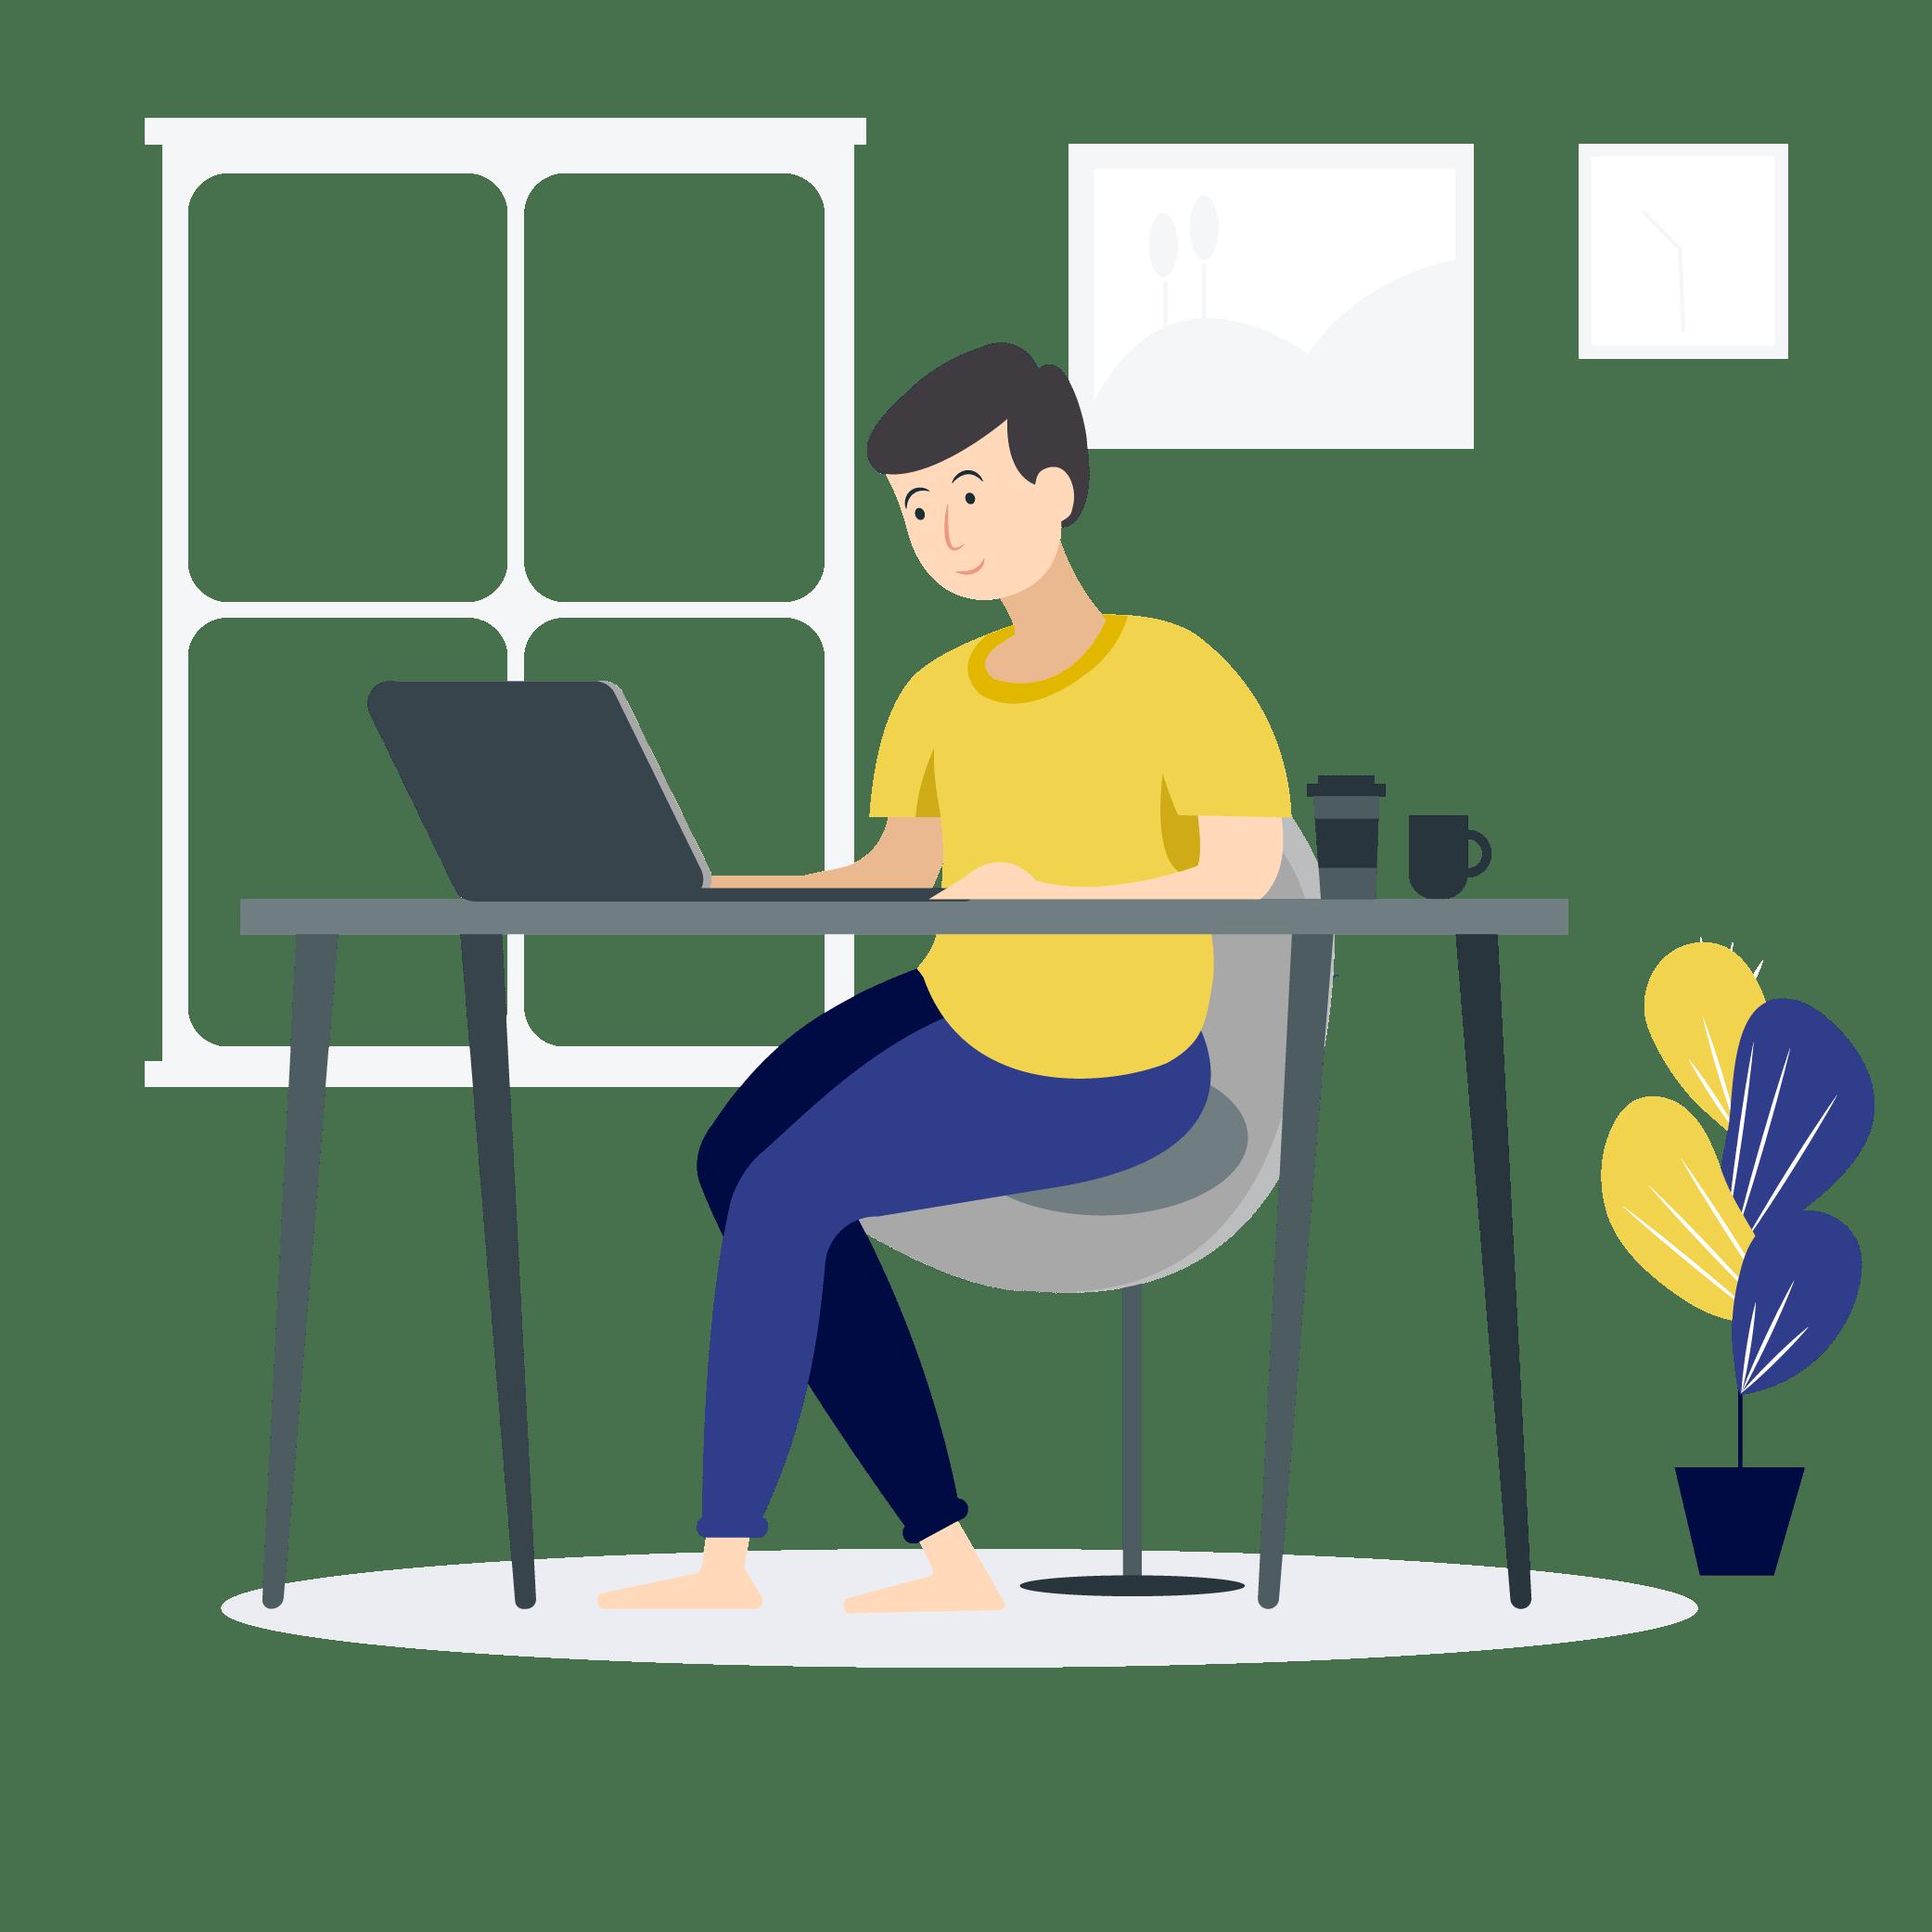 pngtreeyoung-guy-programmer-freelancer-working_5369036-min